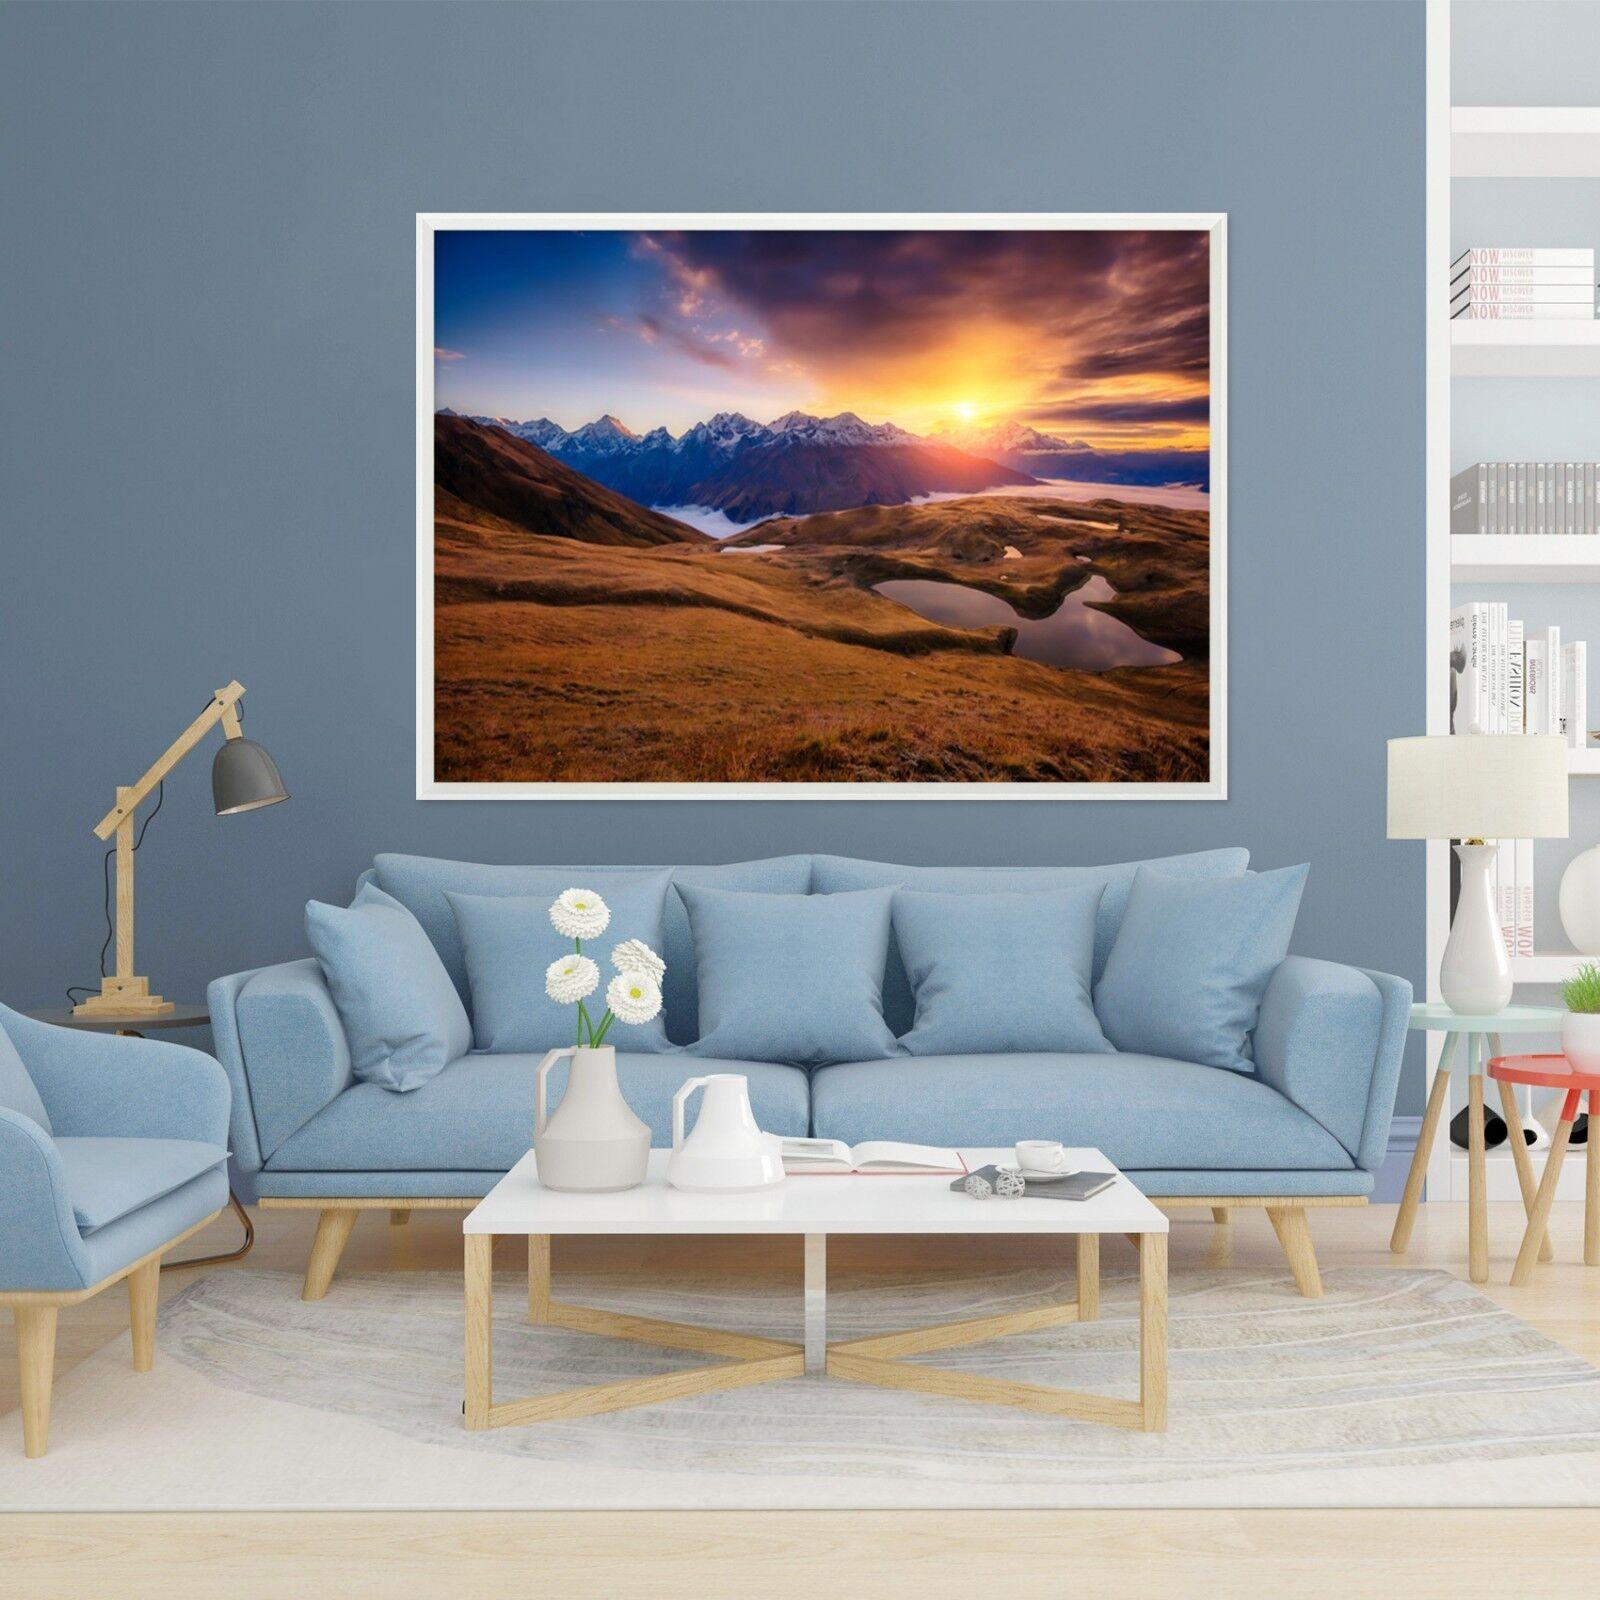 3D Sunset Field 67 Framed Poster Home Decor Print Painting Art AJ WALLPAPER